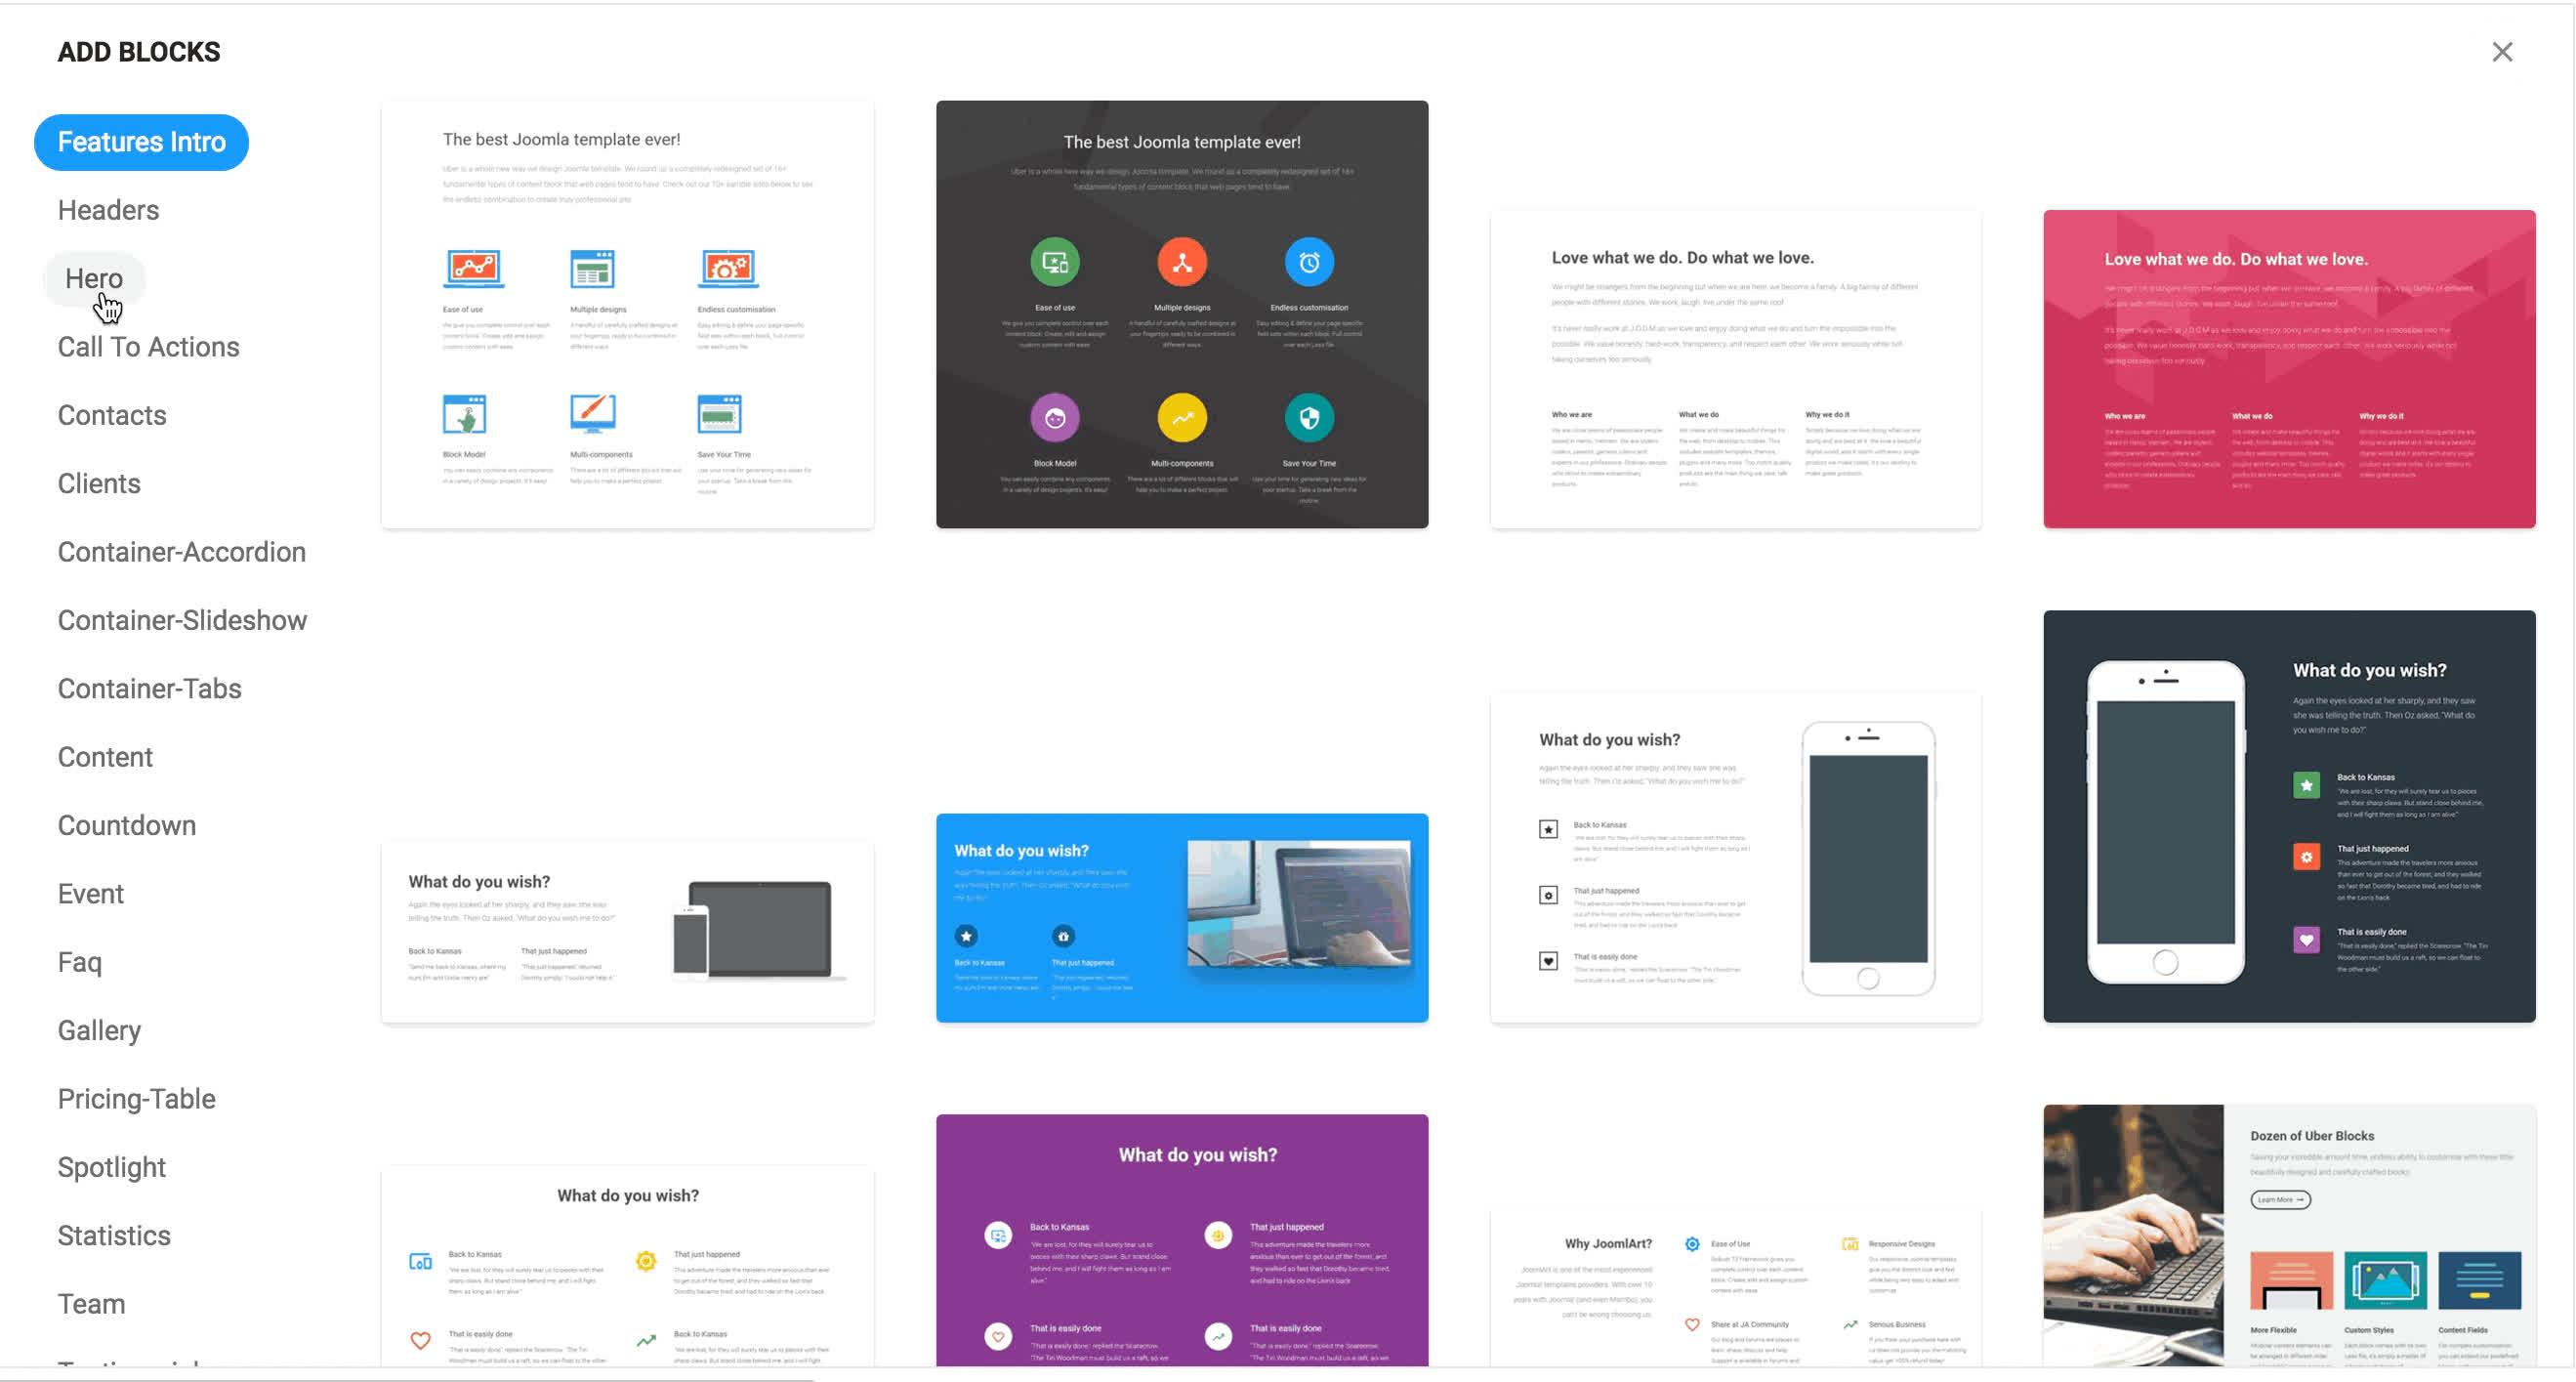 web_design, webdev, Premade Block Content GIFs